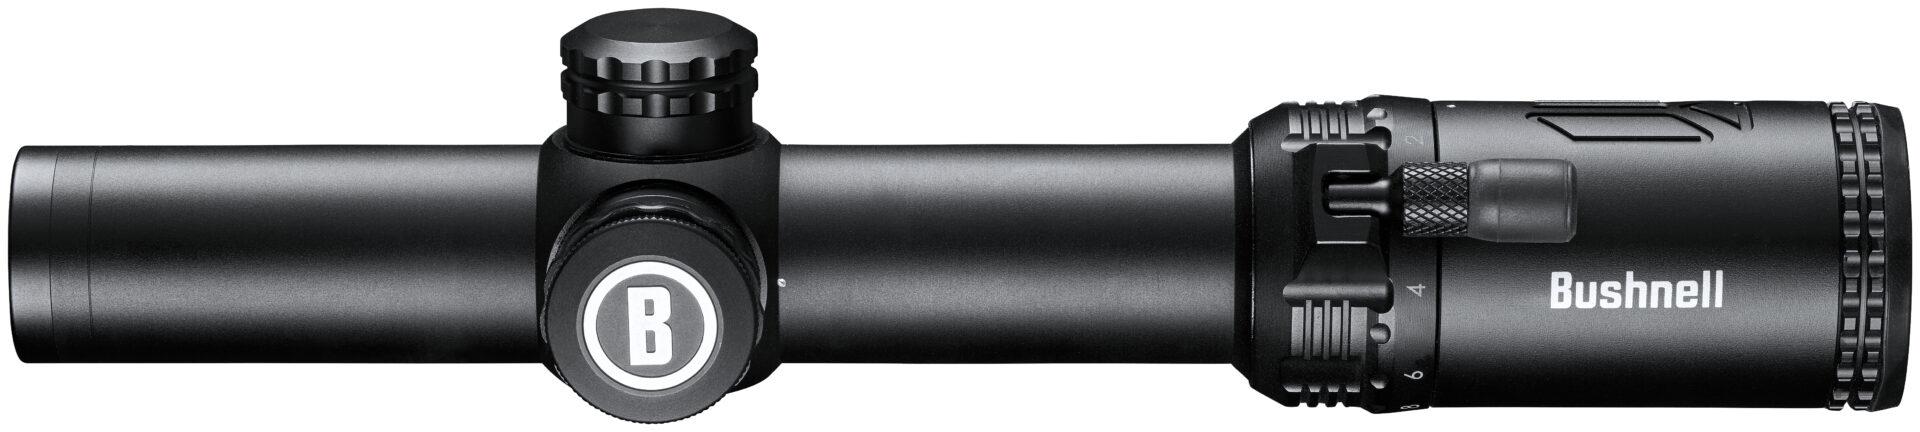 Bushnell 1-8x24 AR Optics scope.